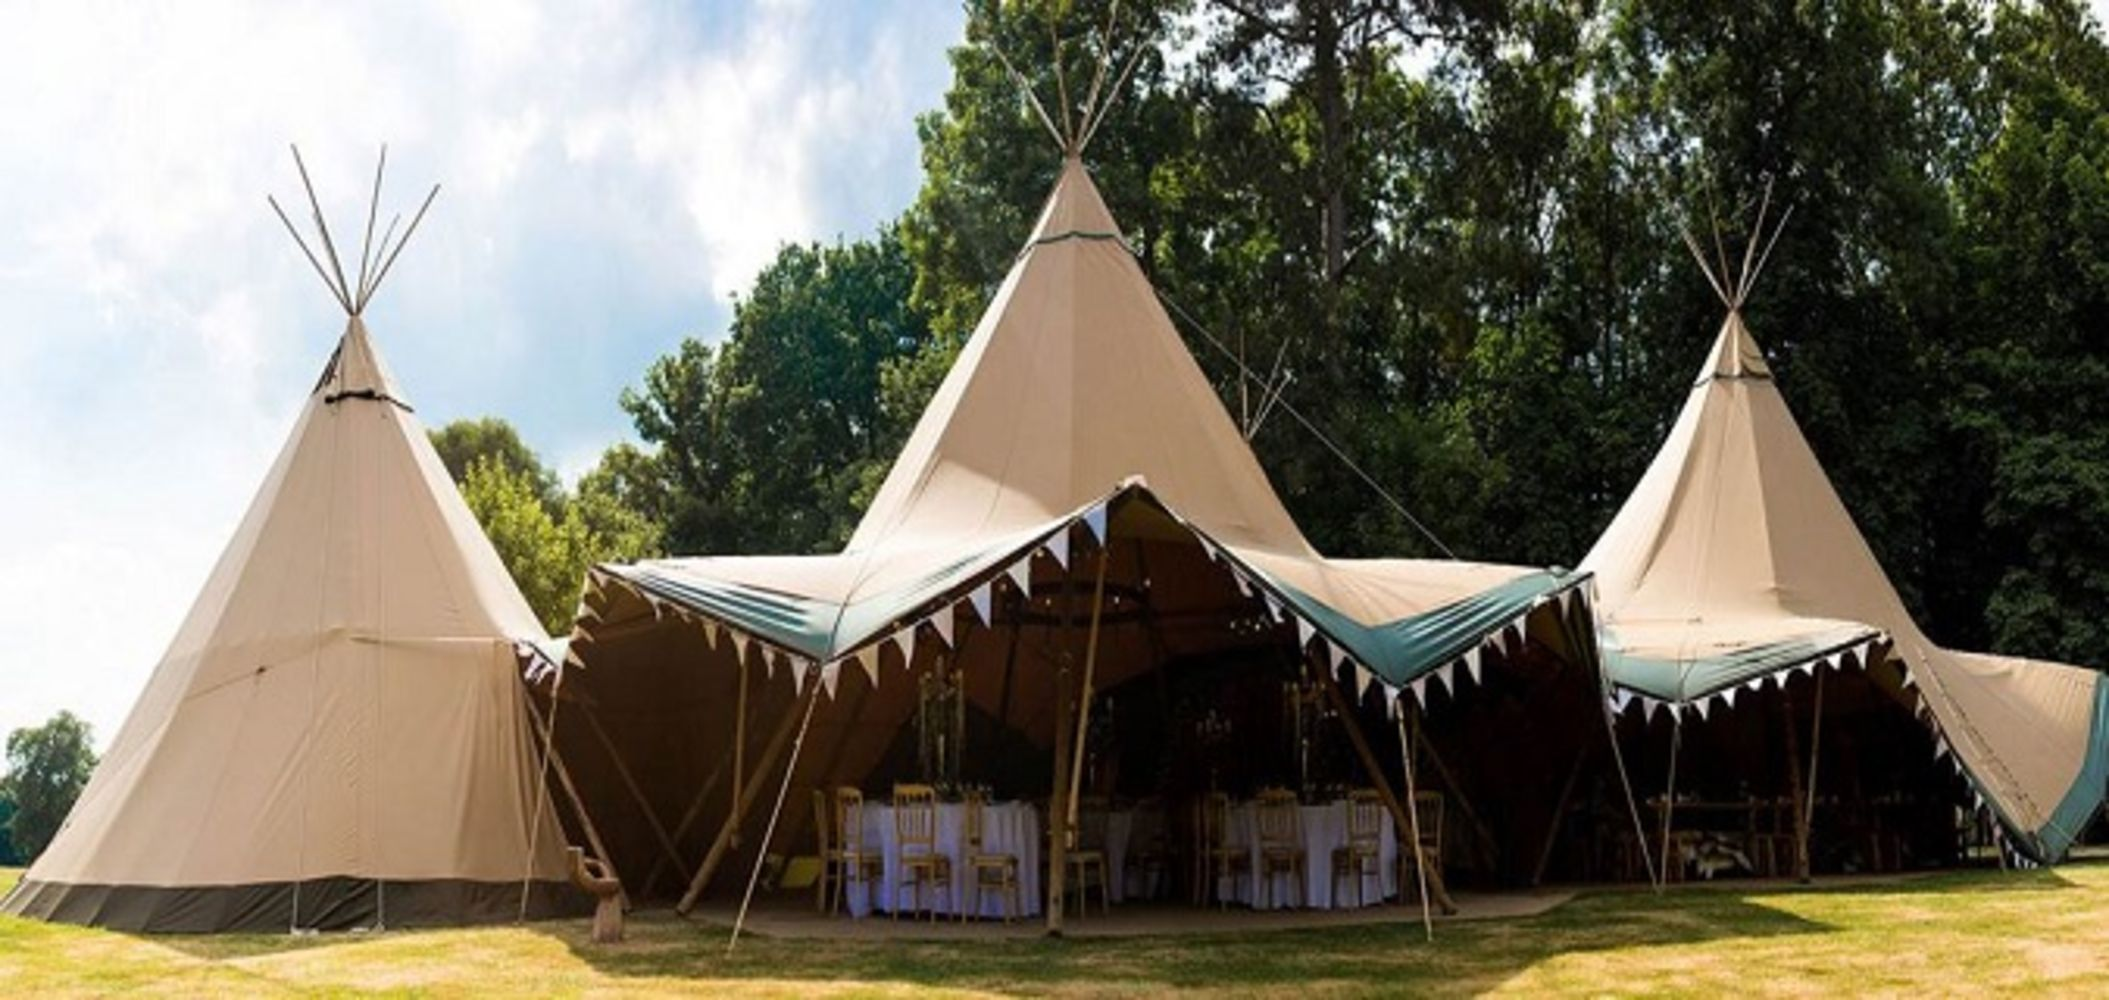 Beautiful World Tent Company Limited t/a Beautiful World Tents